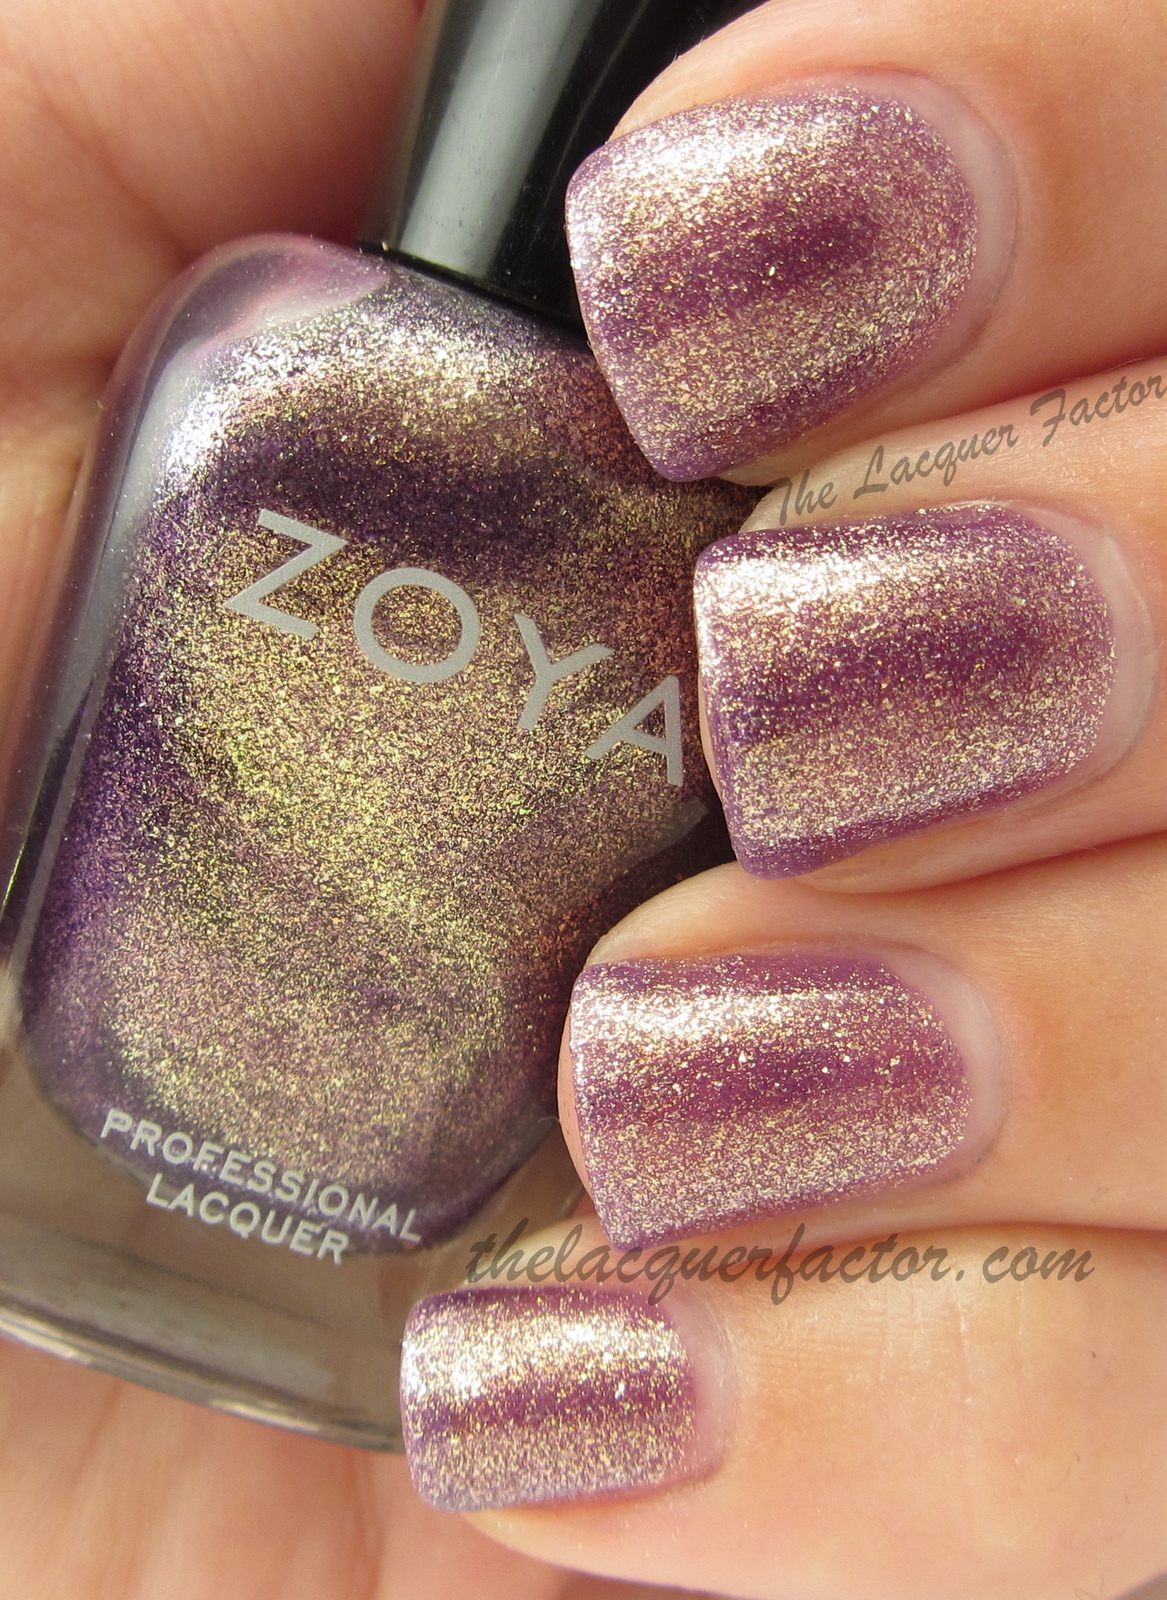 Zoya Nail Polish Daul   The Lacquer Factor Blog   Pinterest   Zoya ...